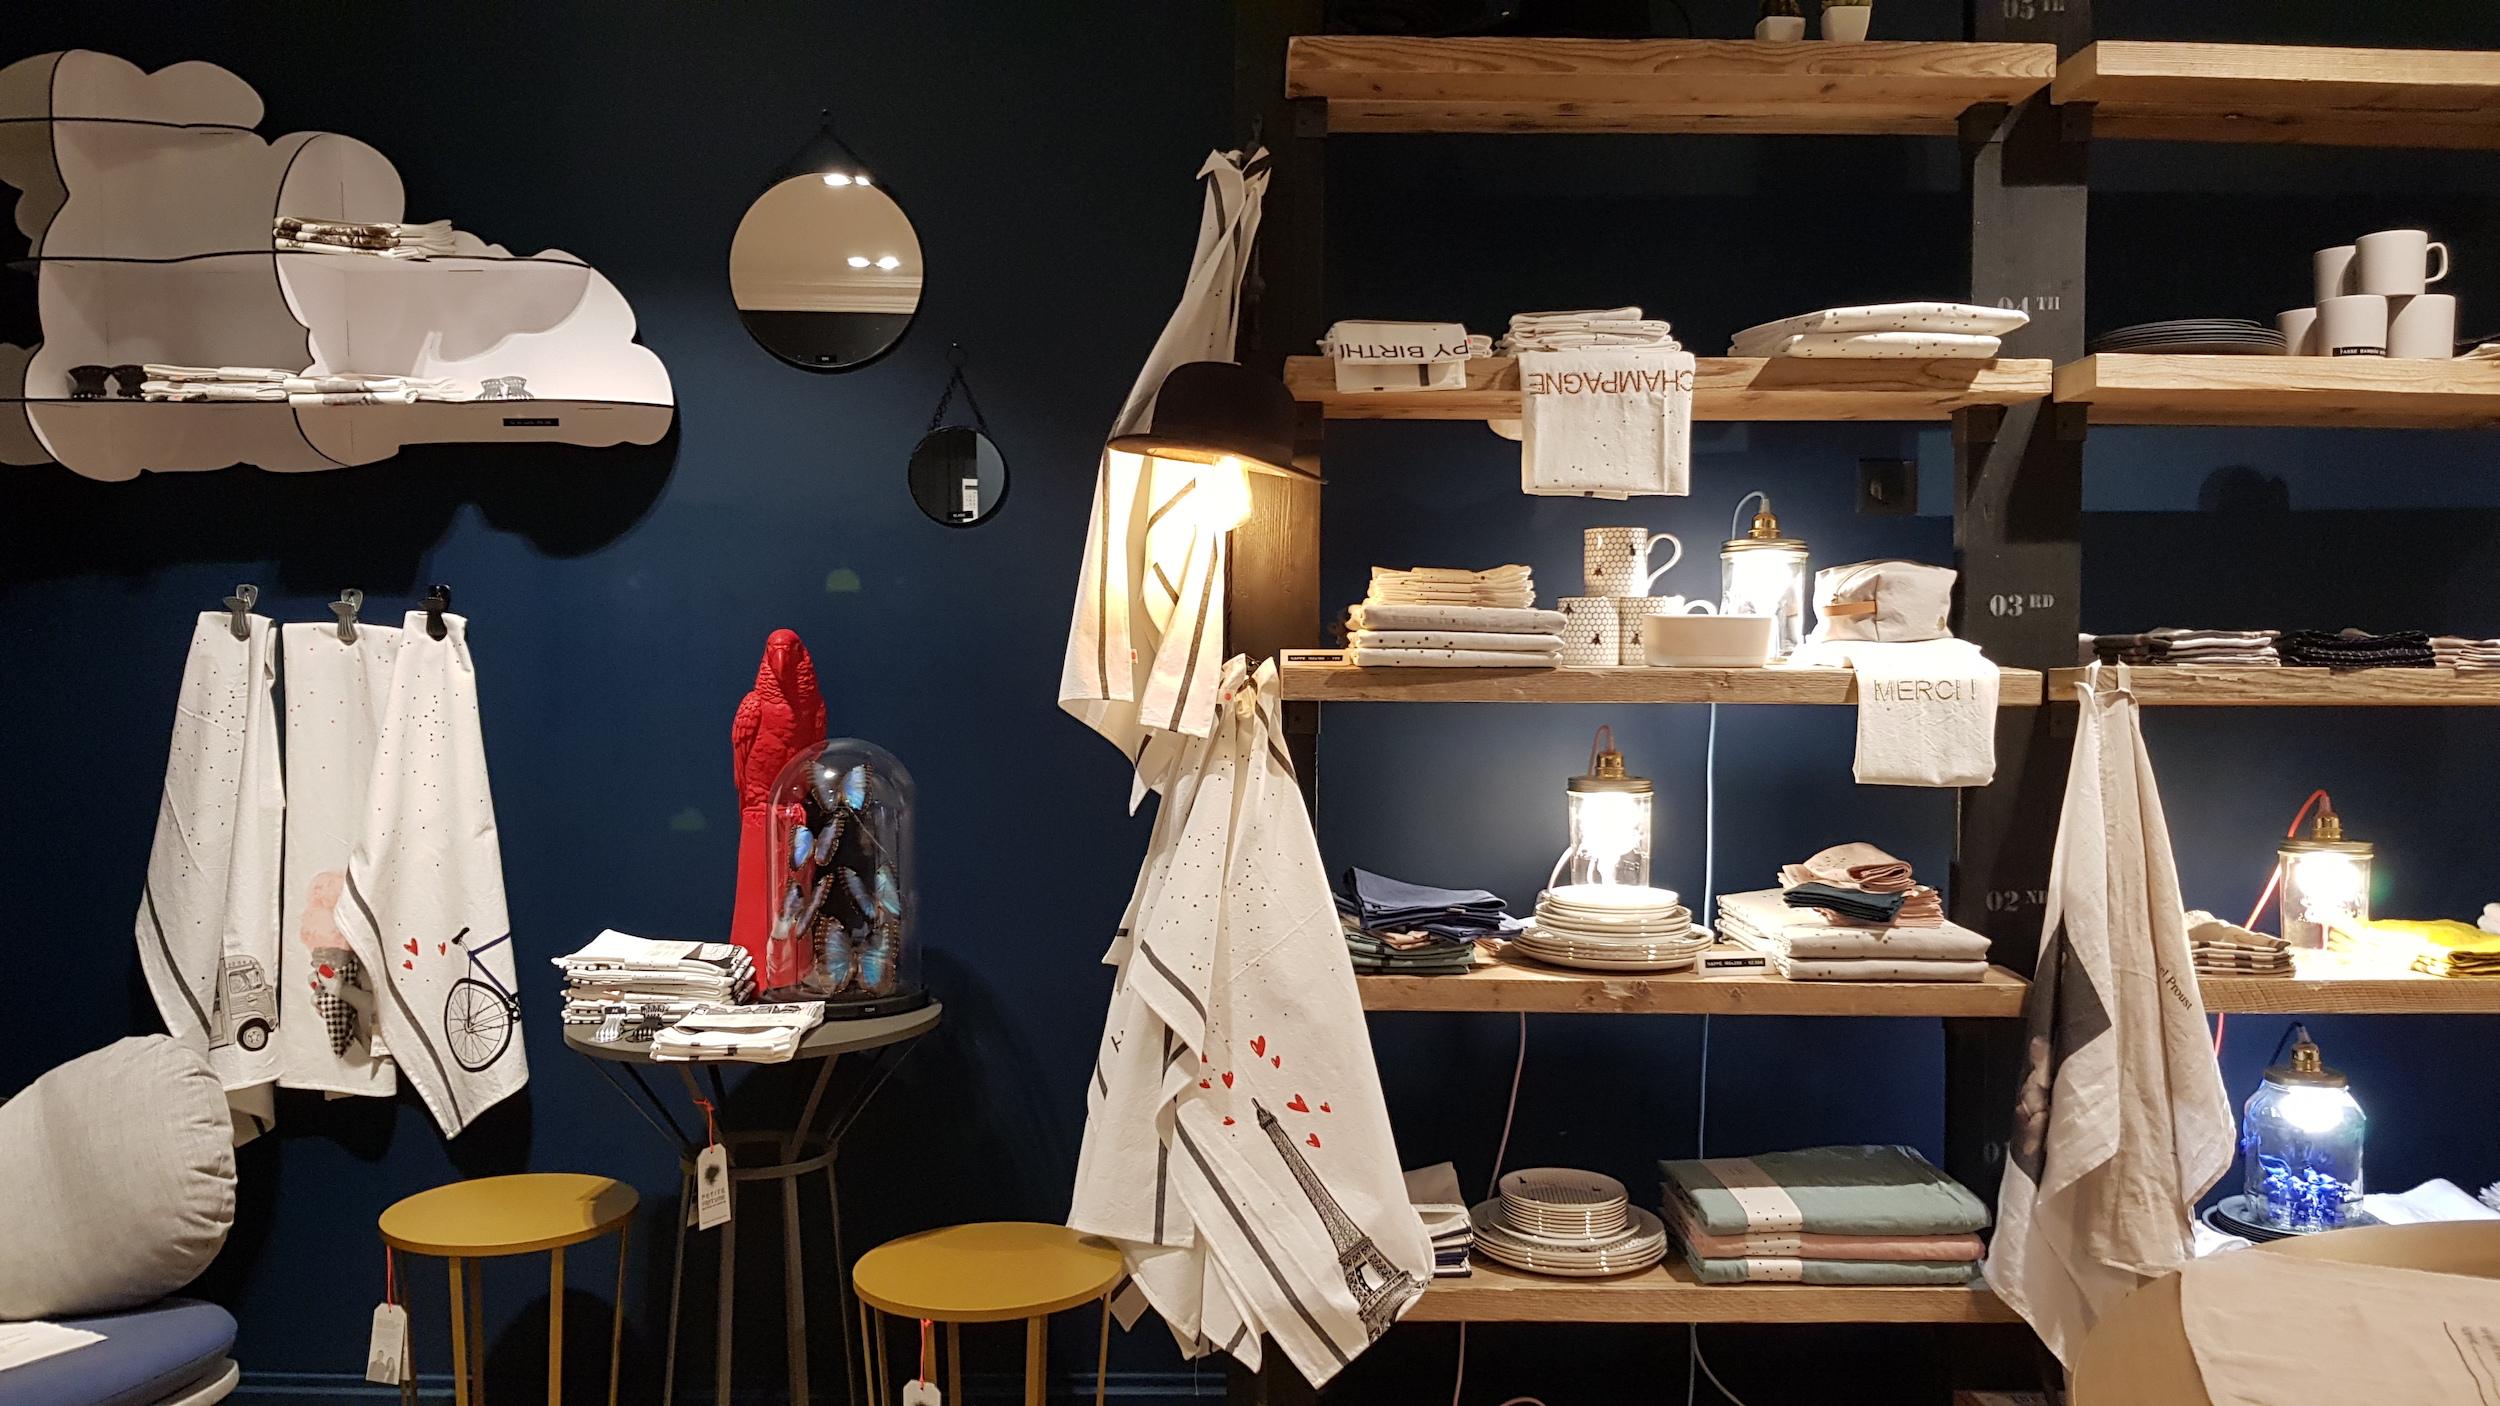 Renovation-boutique-decoration-lagny-77-small-3